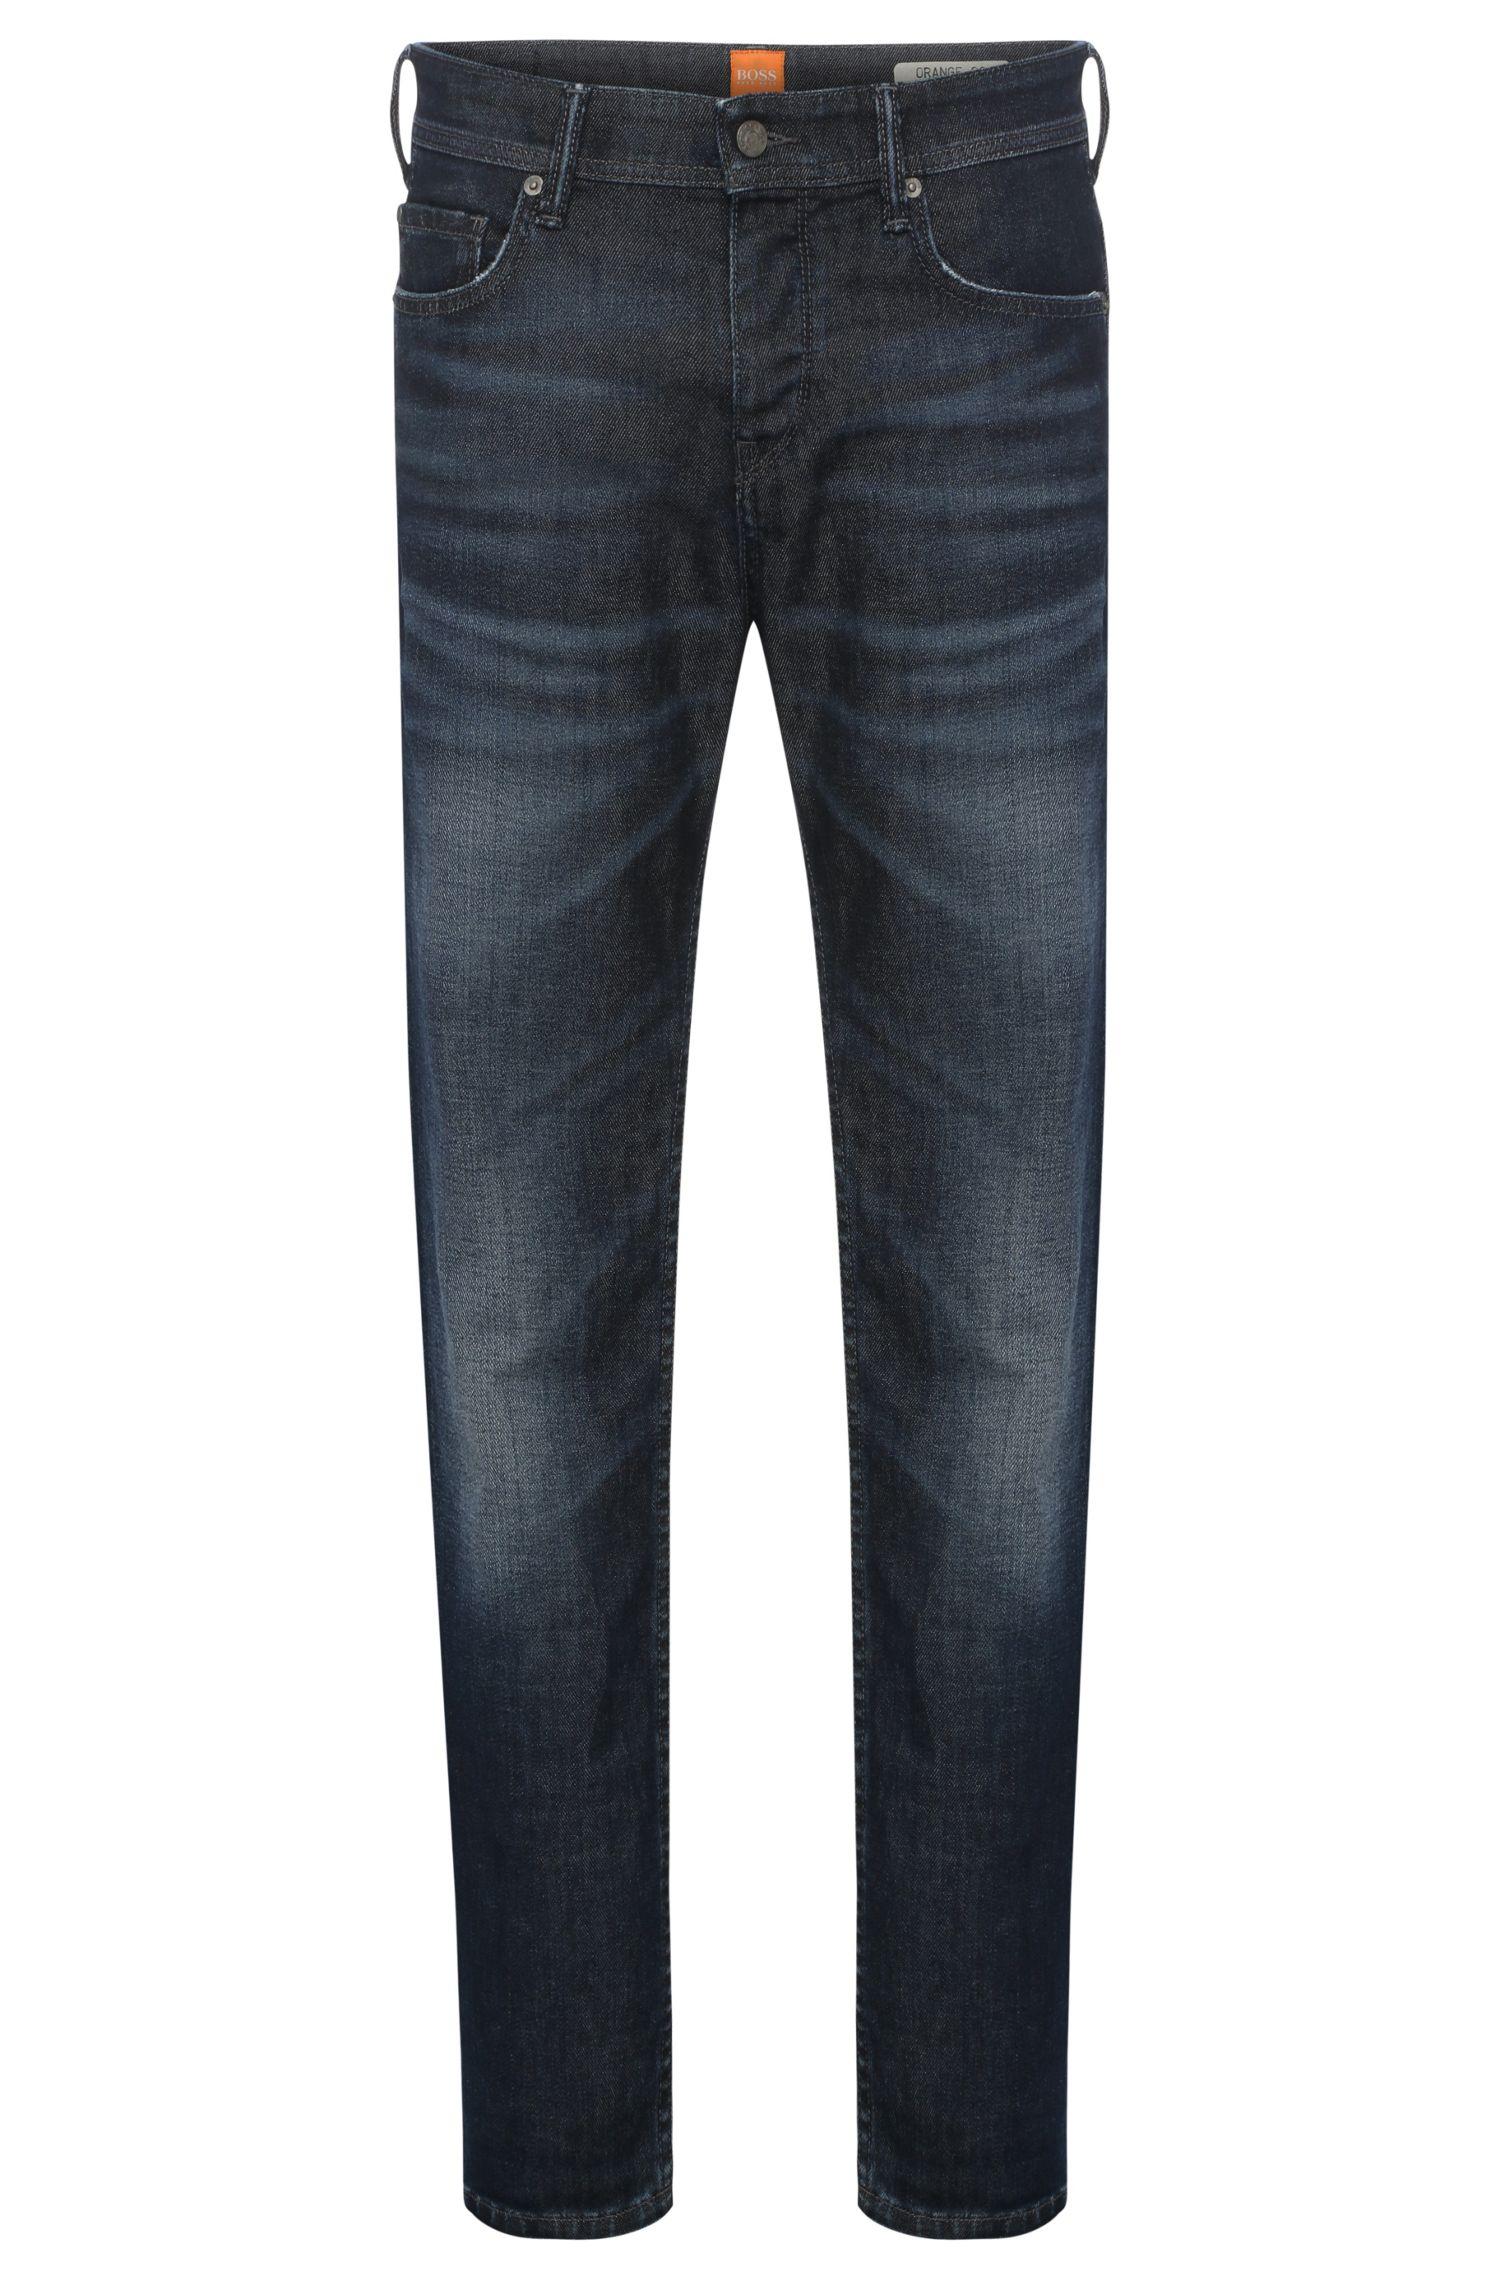 11 oz Stretch Cotton Blend Jeans, Tapered Fit | Orange90